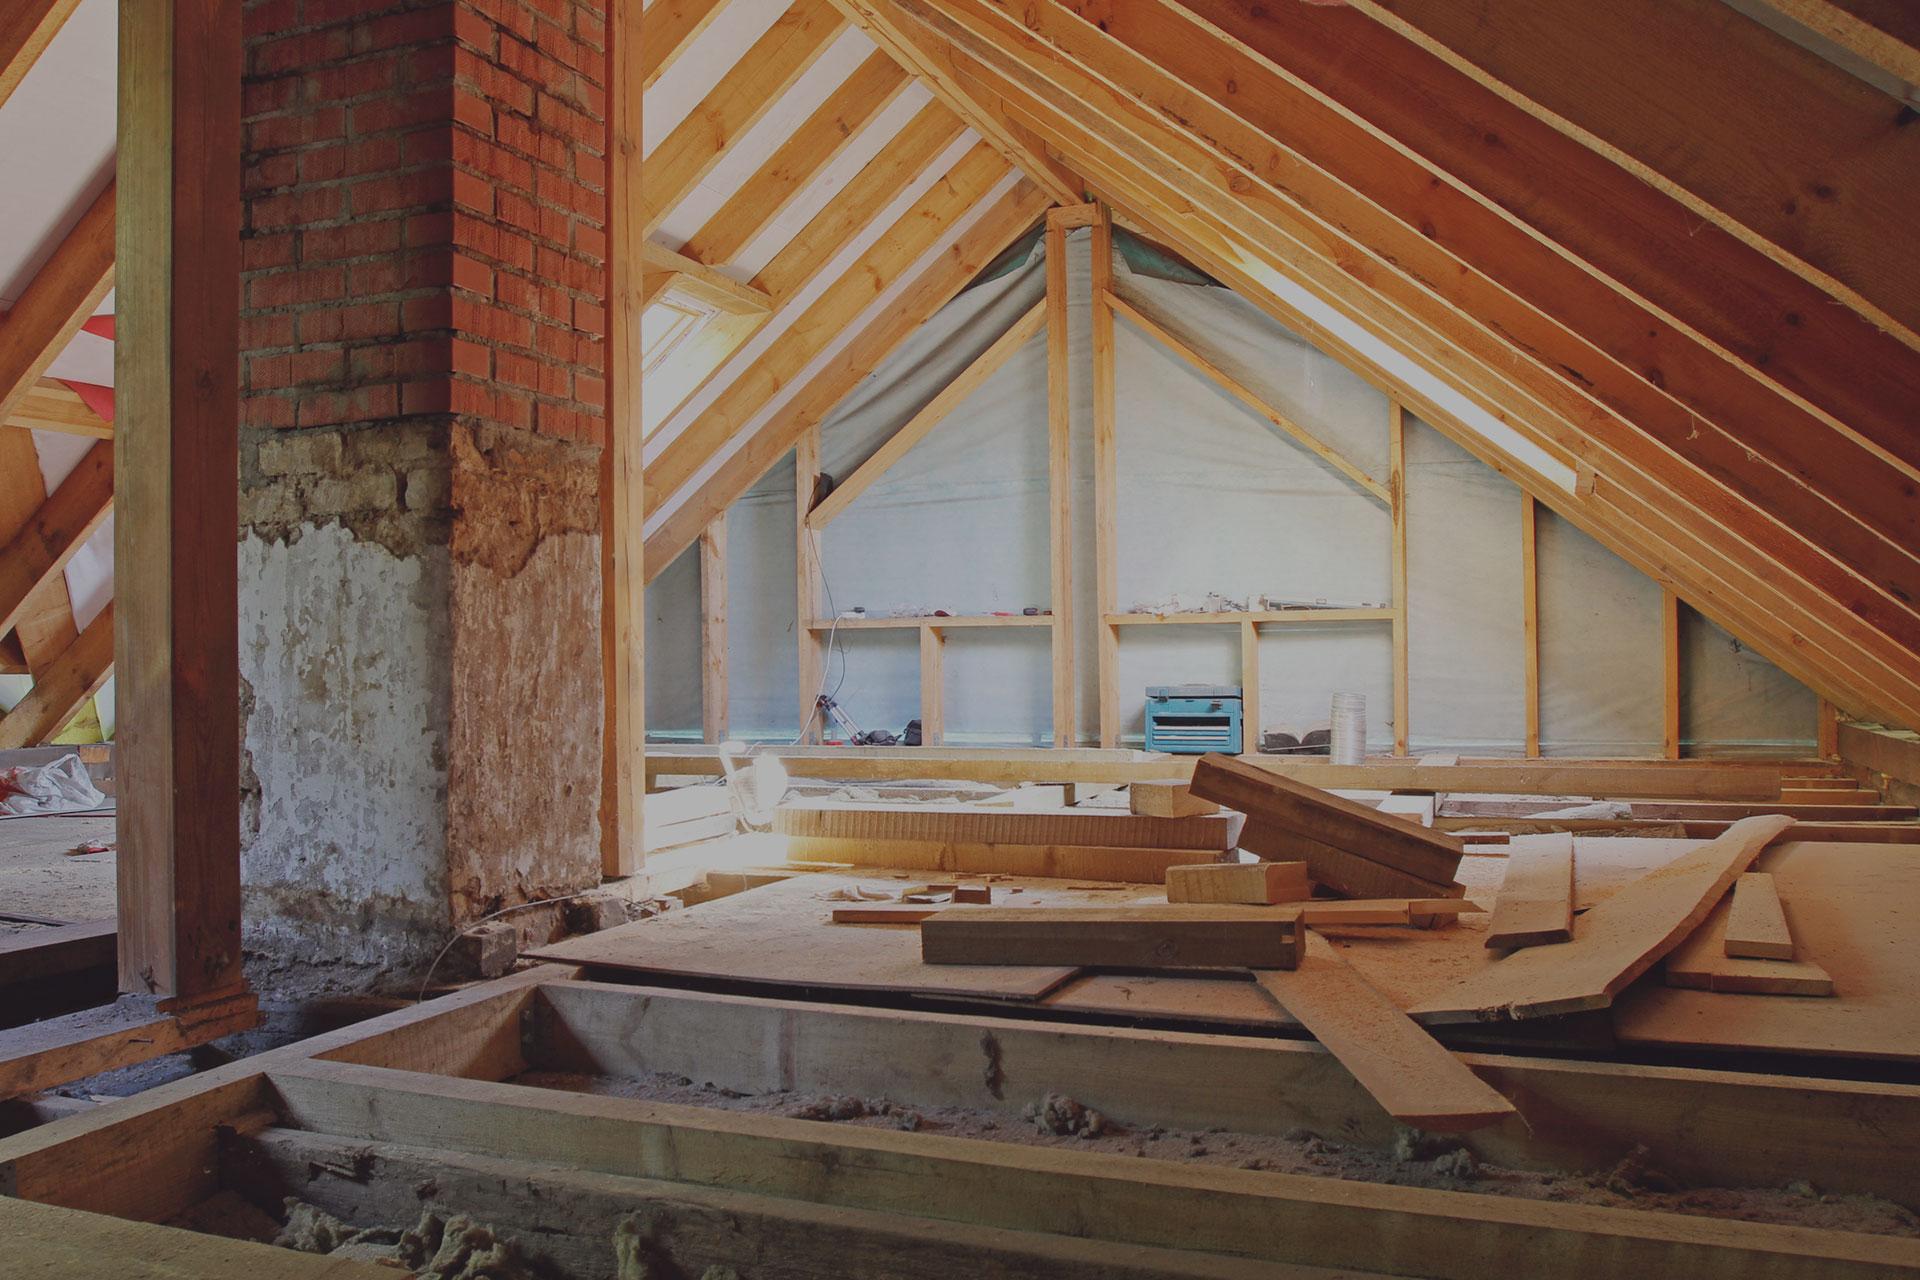 Attic construction